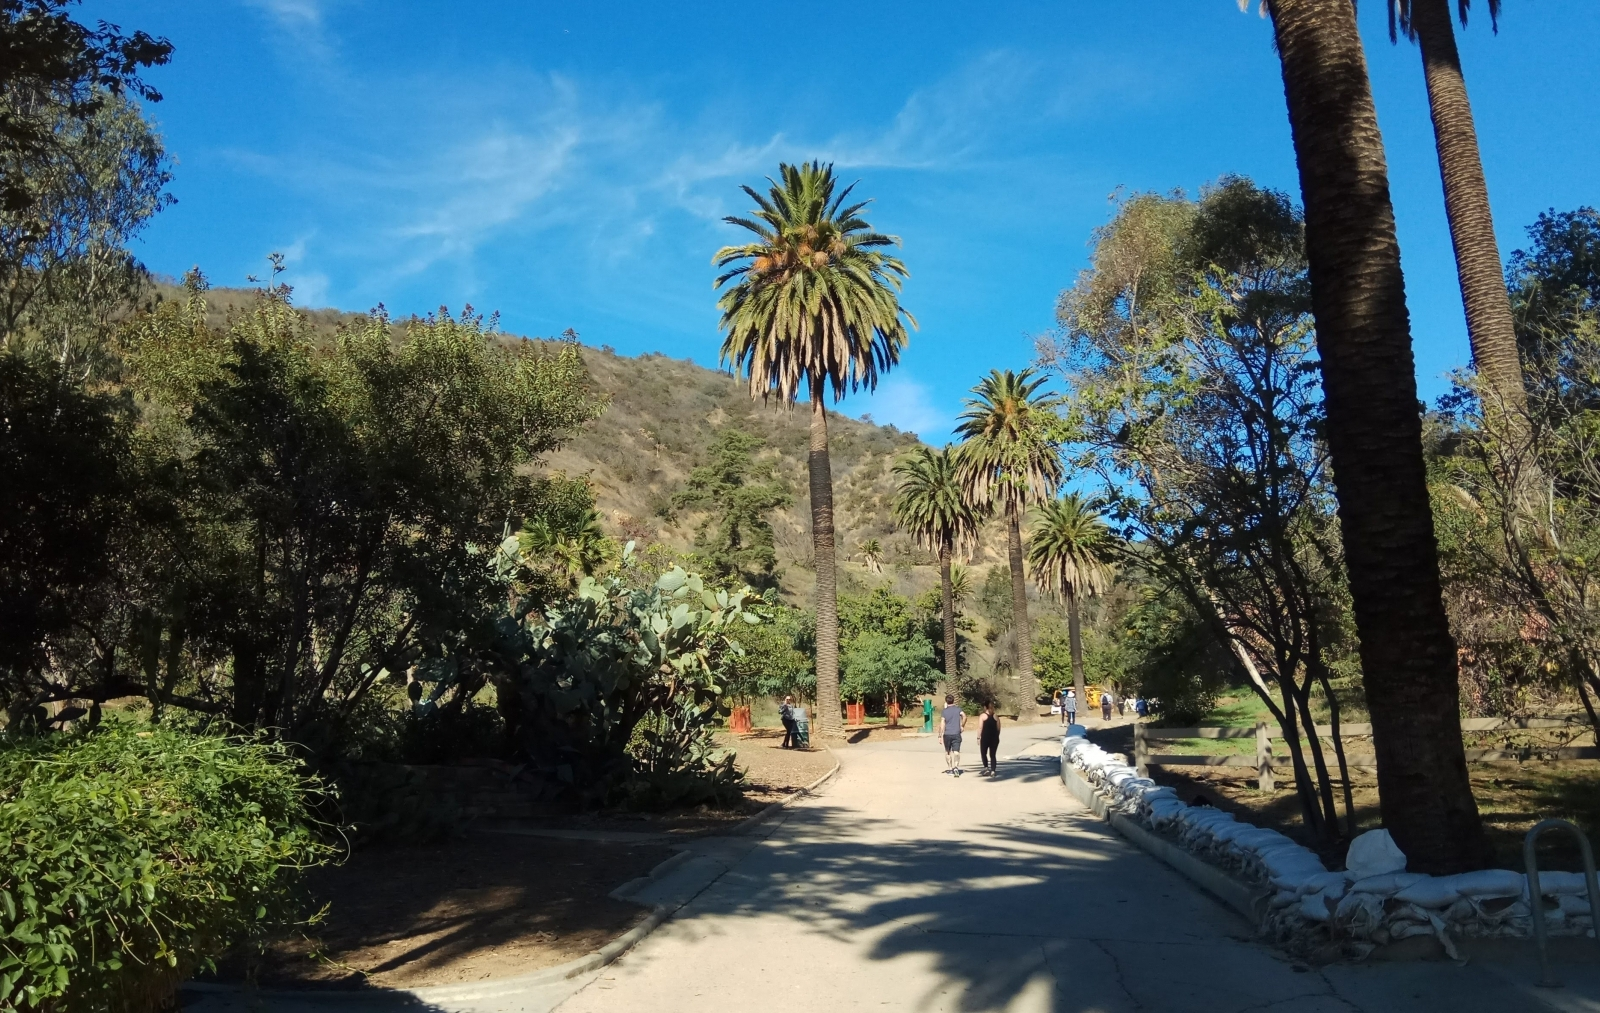 Дорога к парку «Раньон Каньон»